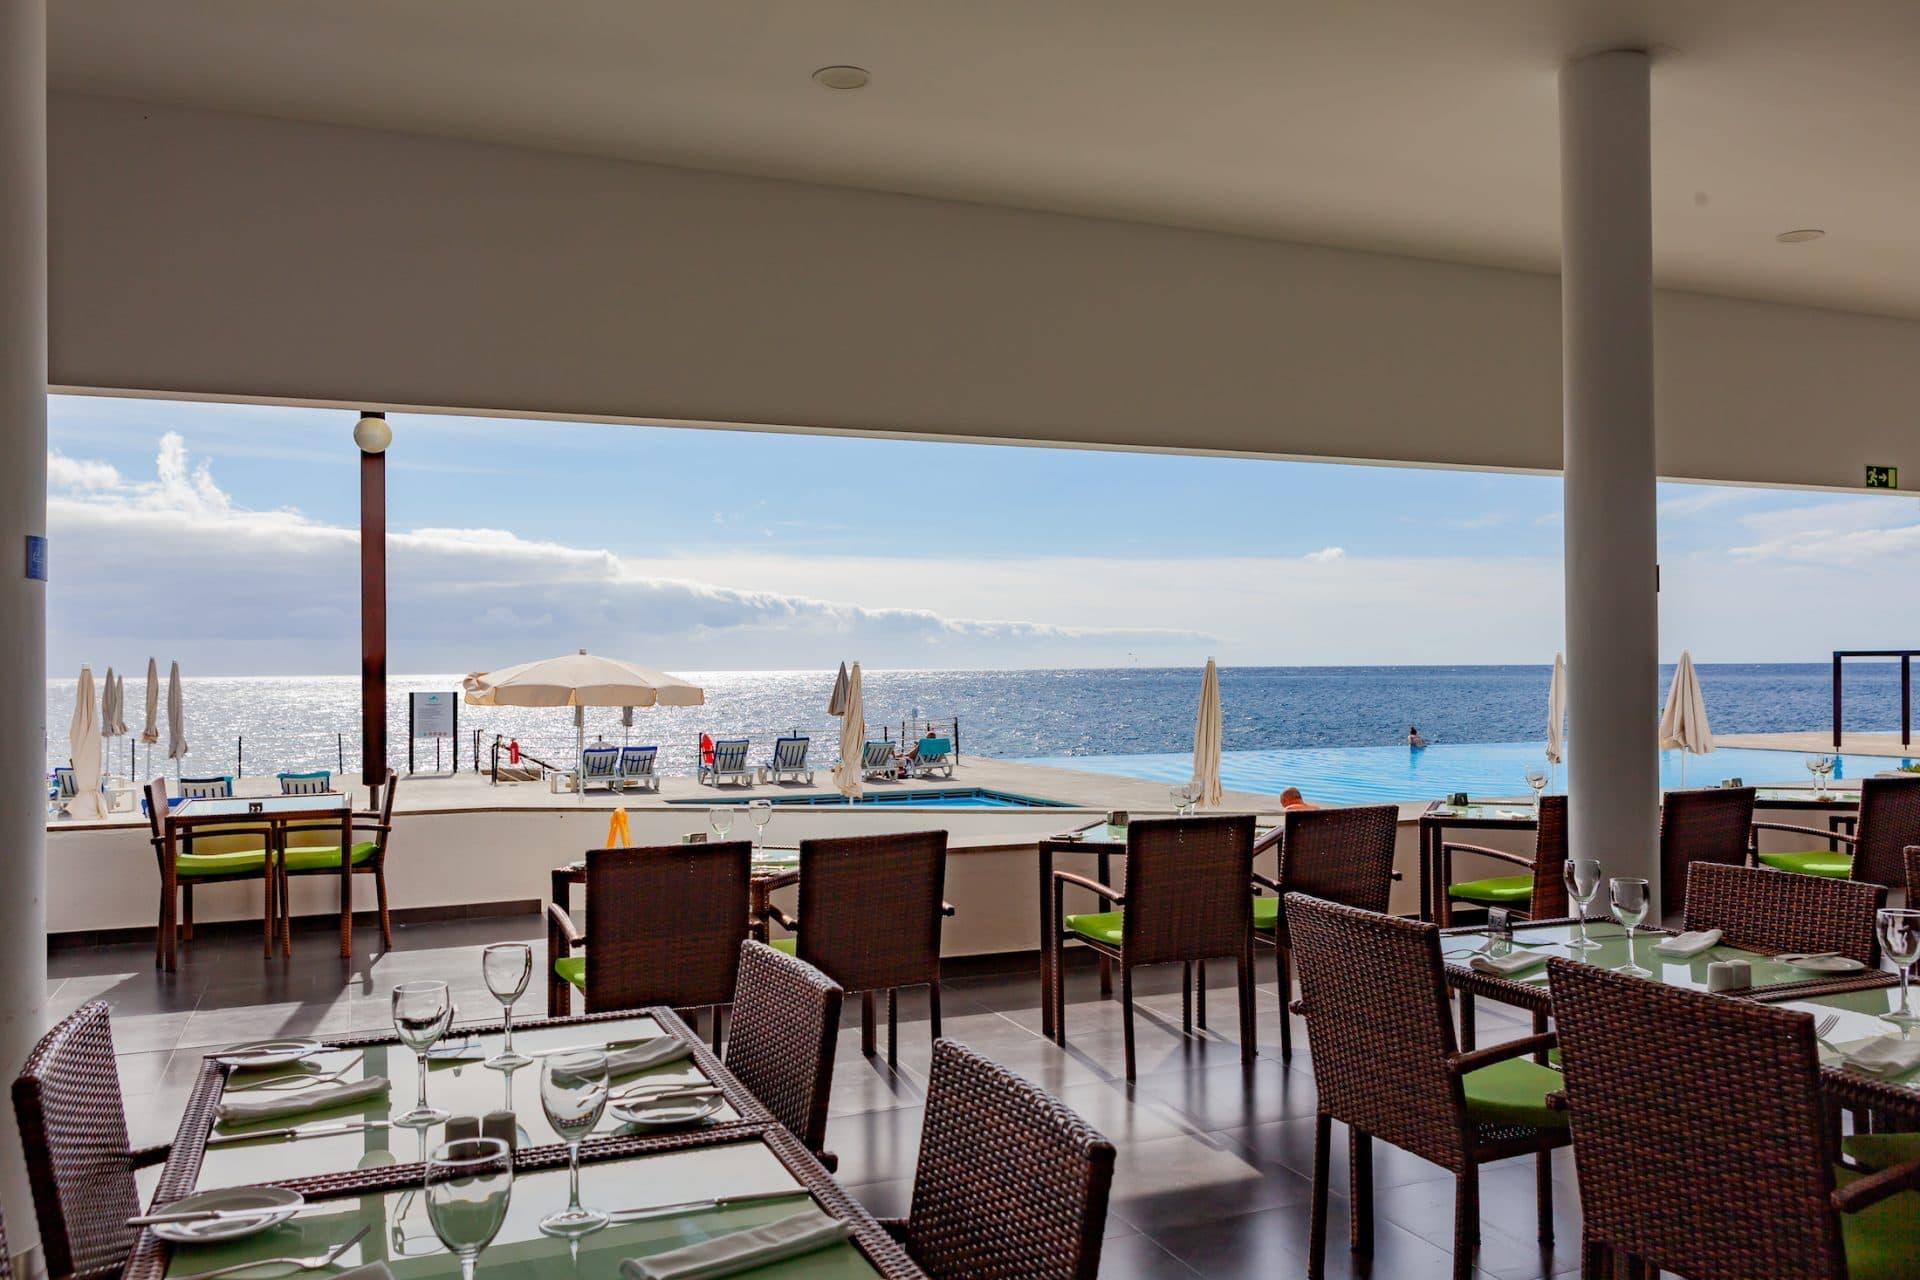 sabor-mar-interior-VidaMar-Hotels-Resorts-Madeira